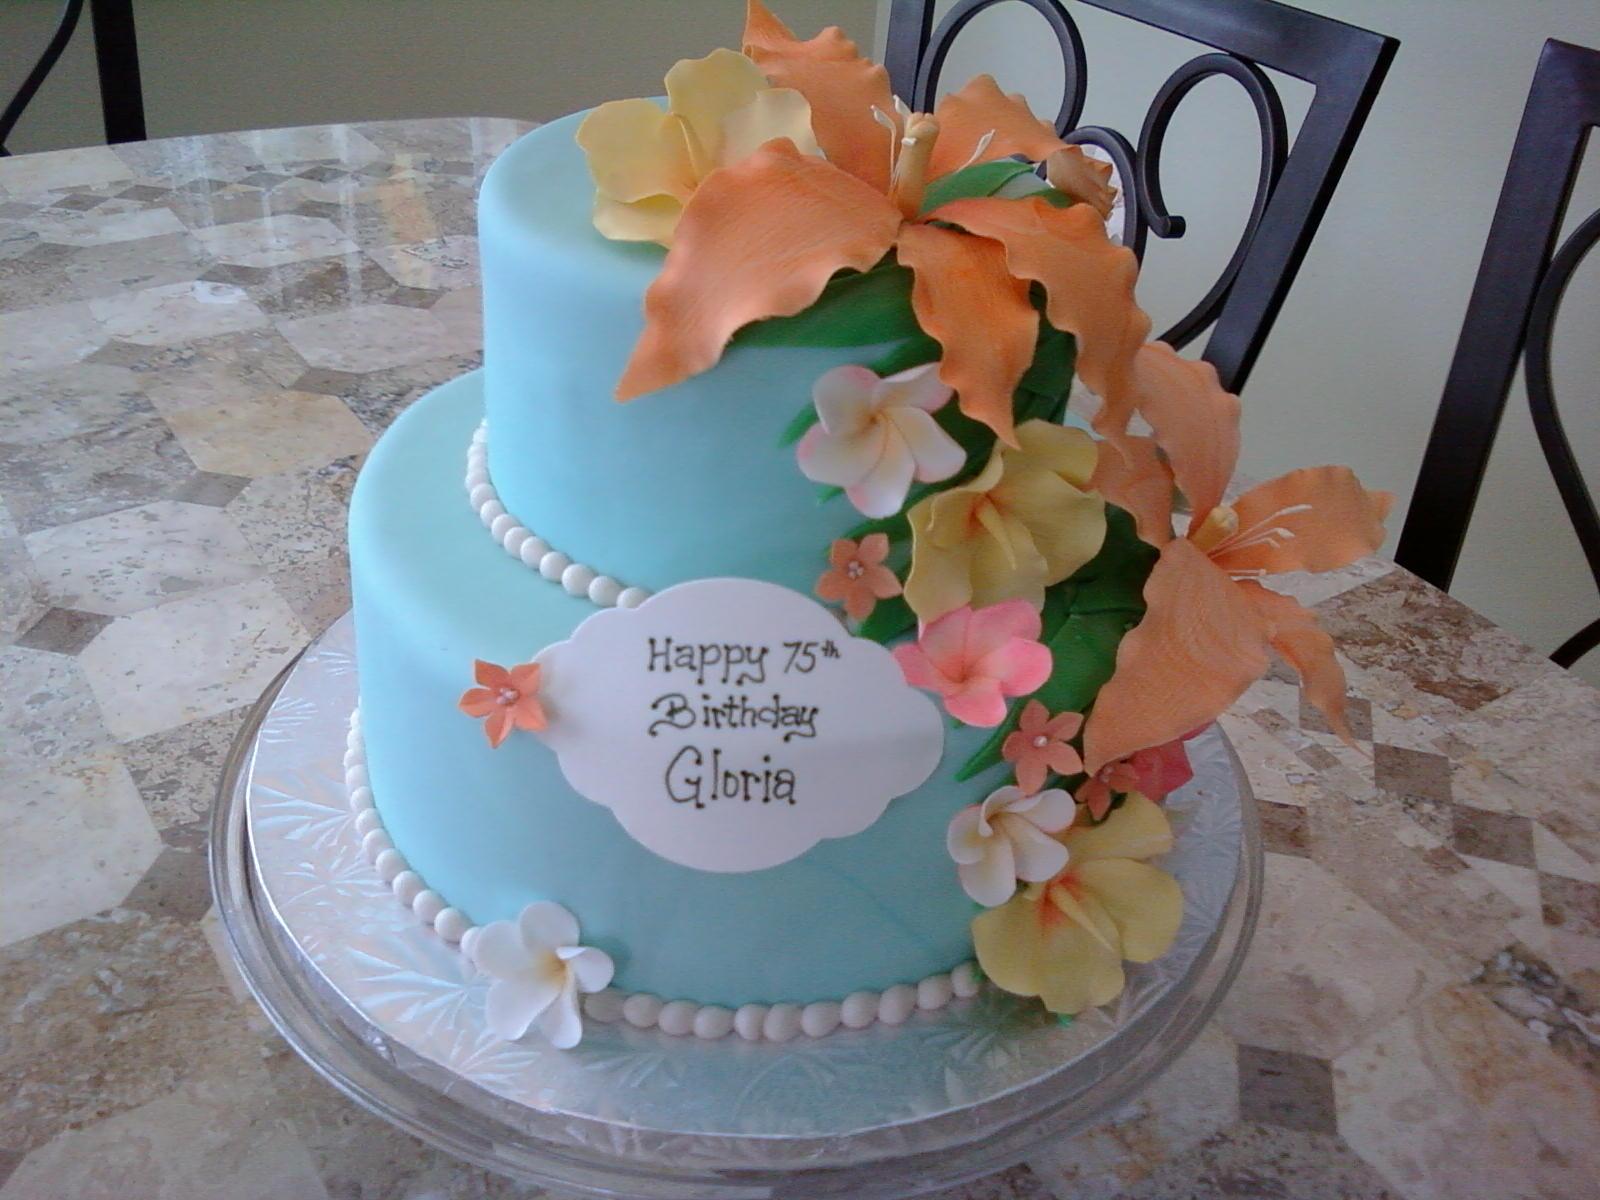 11 Luau Birthday Cakes For Adults Photo Adult Luau Birthday Cake